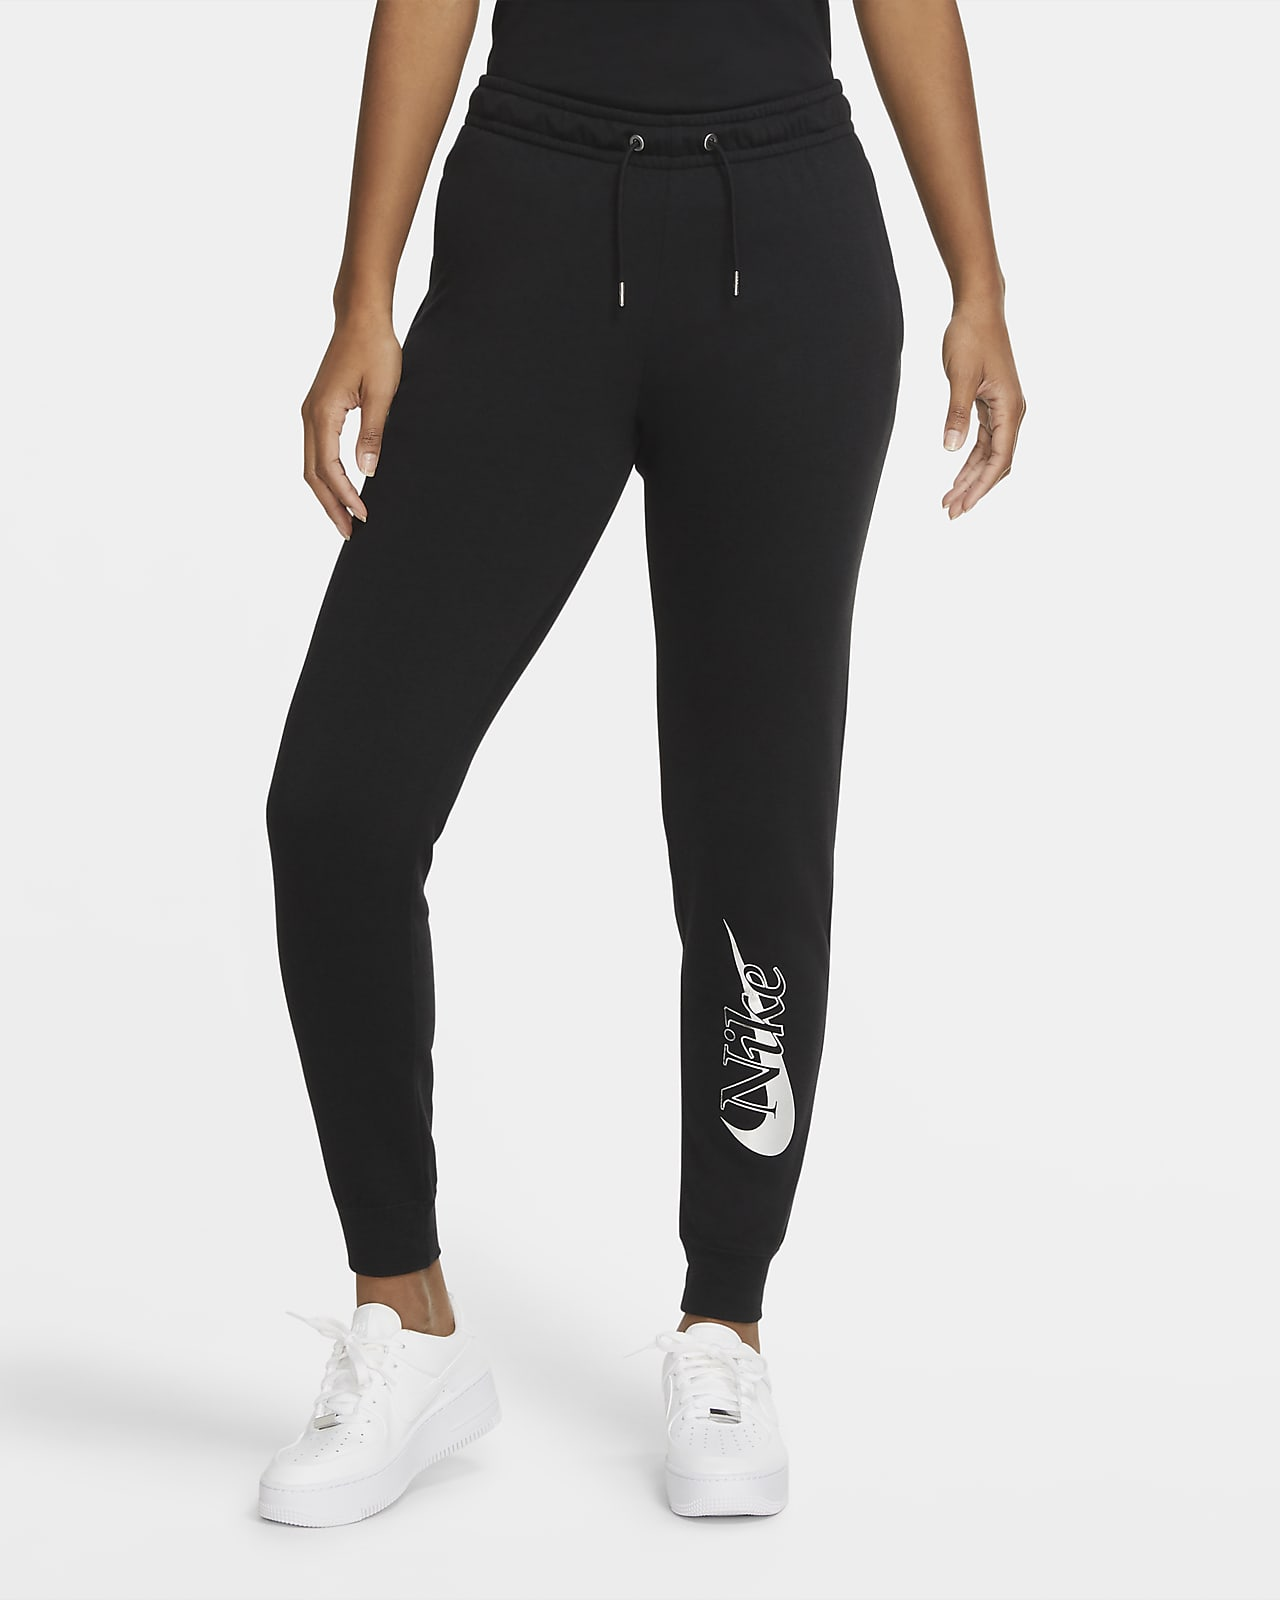 Pantalón Nike CU6487-010